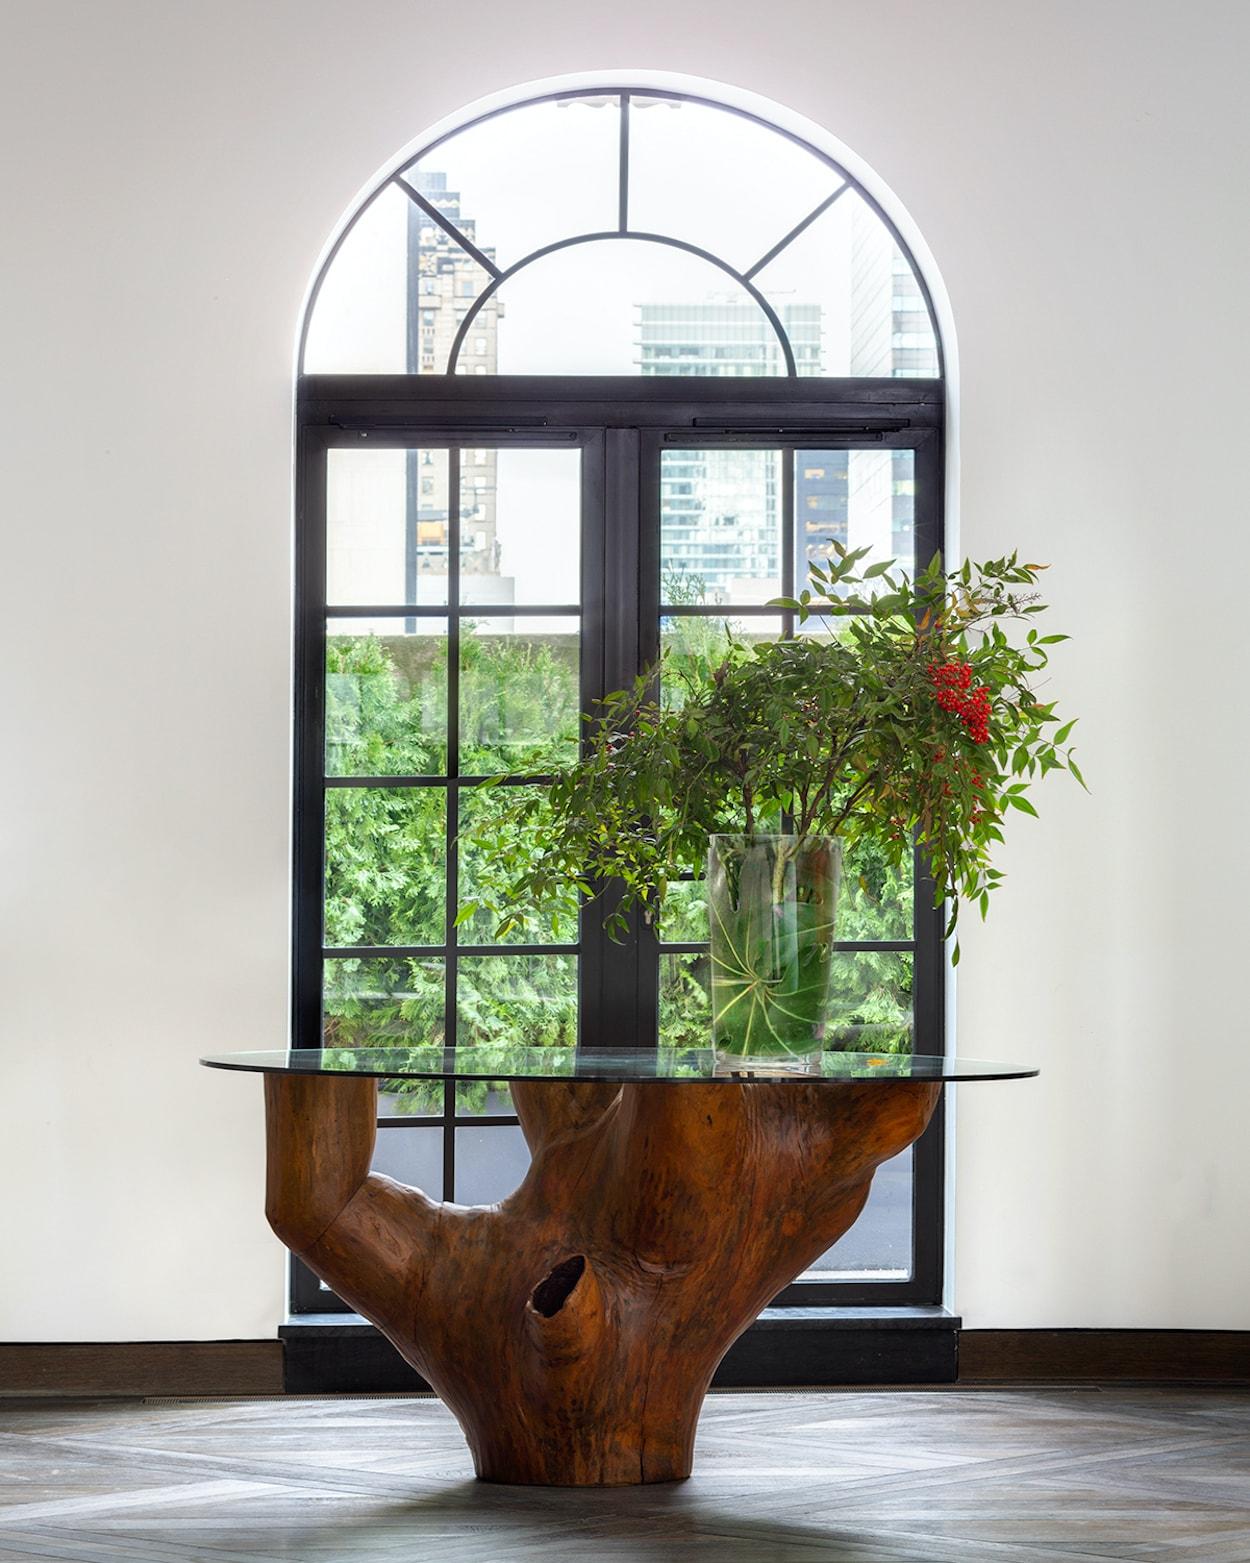 2_©_Robert_Granoff_111_W_57th_PH_20_Living_Room_Dining_Table_Detail-min